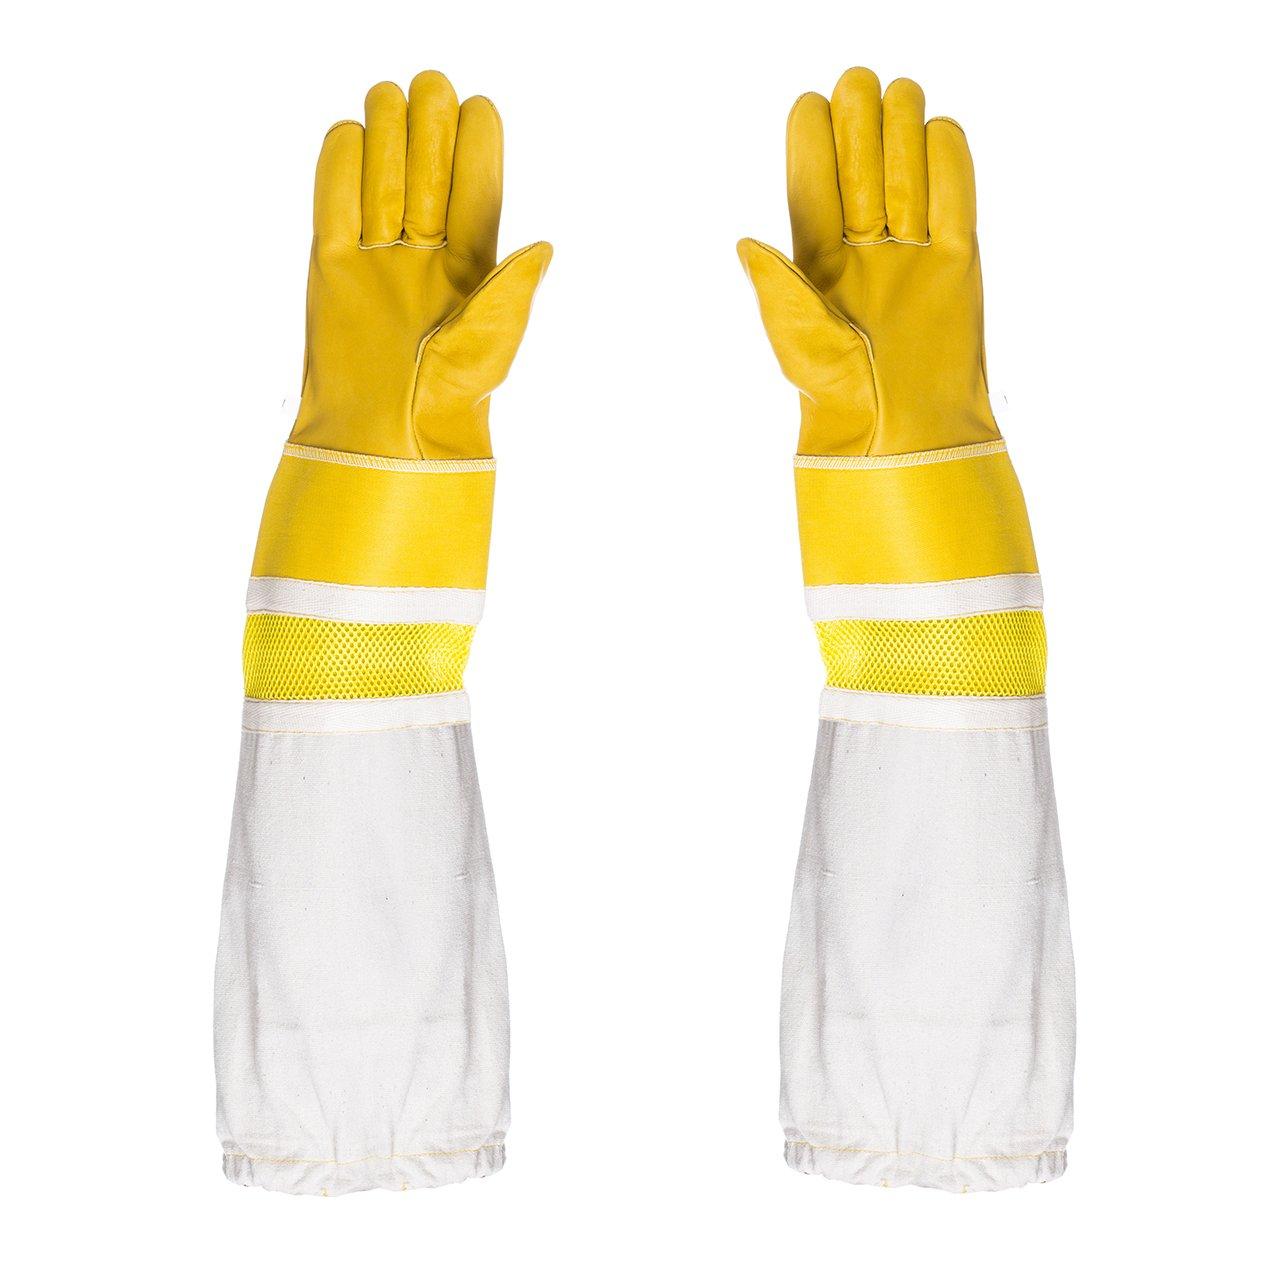 Zubehör Imkerhandschuhe Handschuhe Universal 1 Paar Halten Belüftet Pack